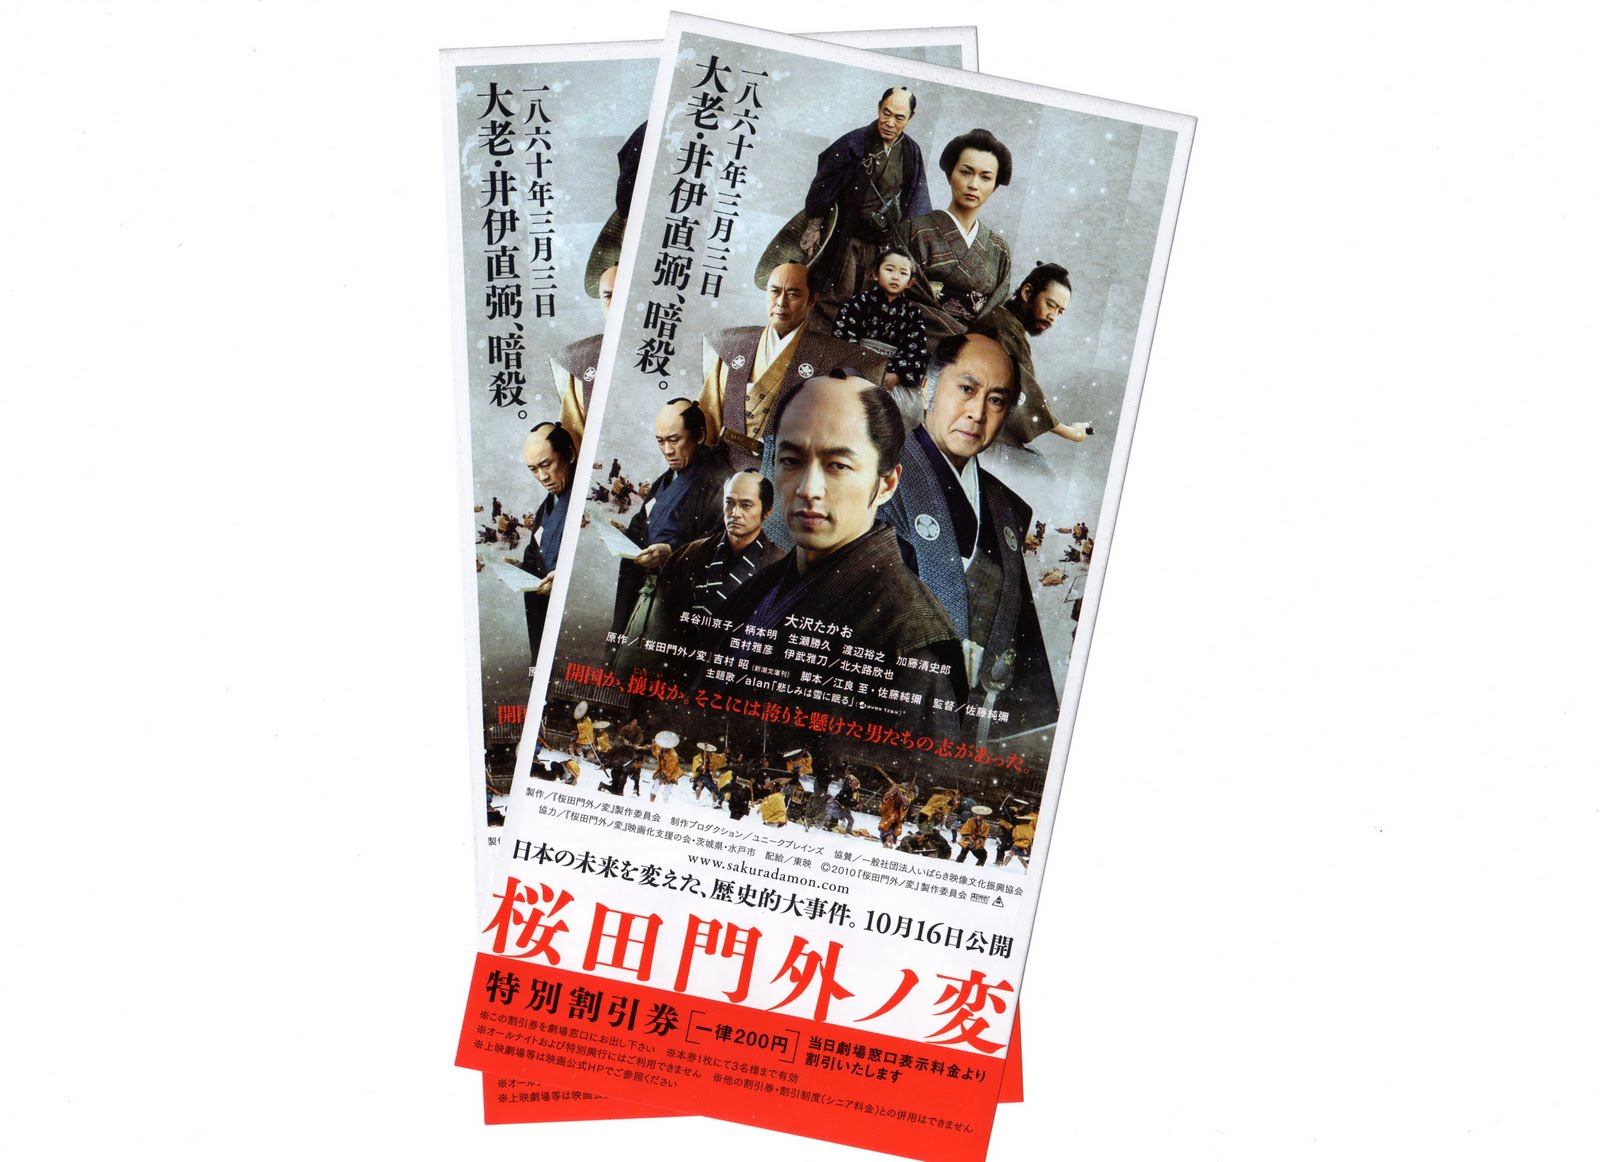 Ichijoji Swords On The Screen